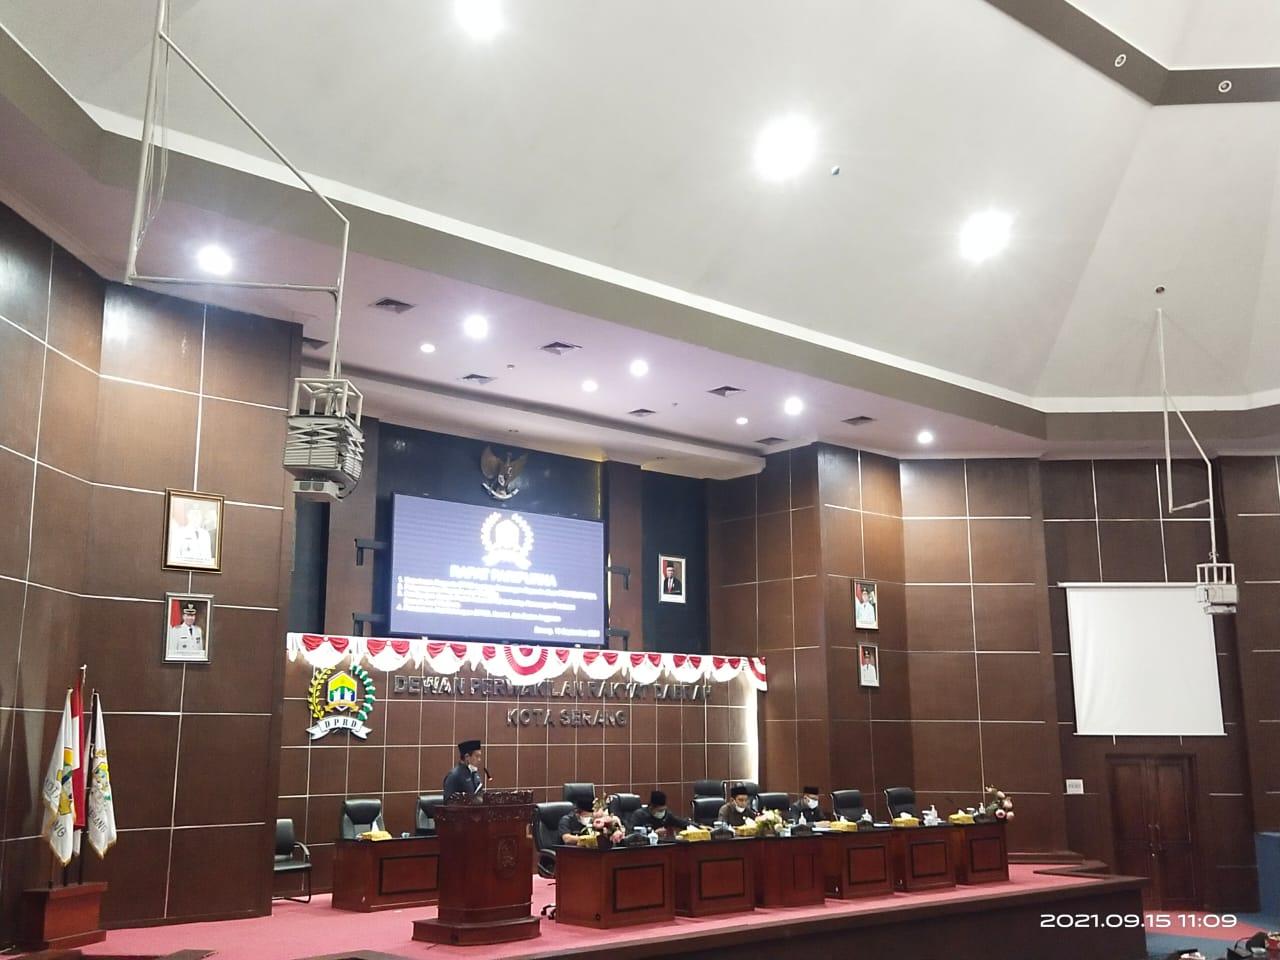 FRAKSI Partai Nasdem Menjadi Ketua Komisi II DPRD Kota Serang bidang ekonomi kesejahteraan Rakyat.